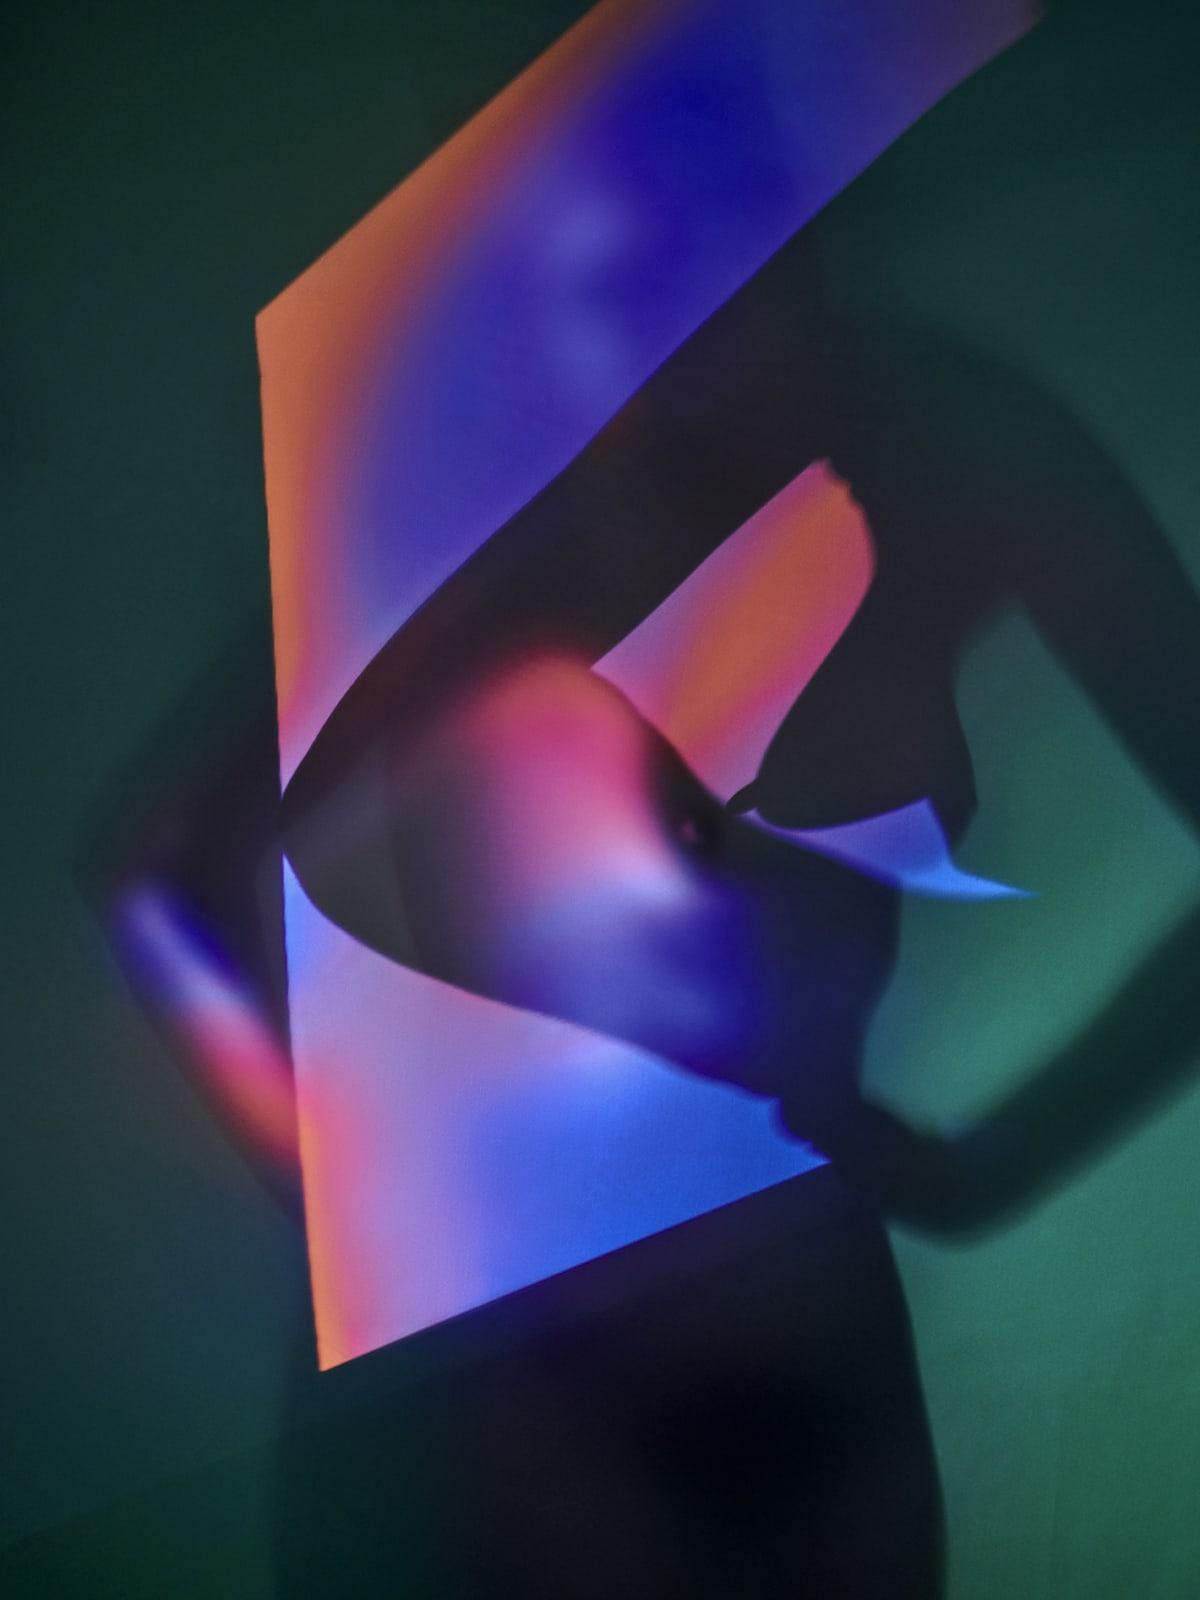 Carli Hermès, Distortion - Squared